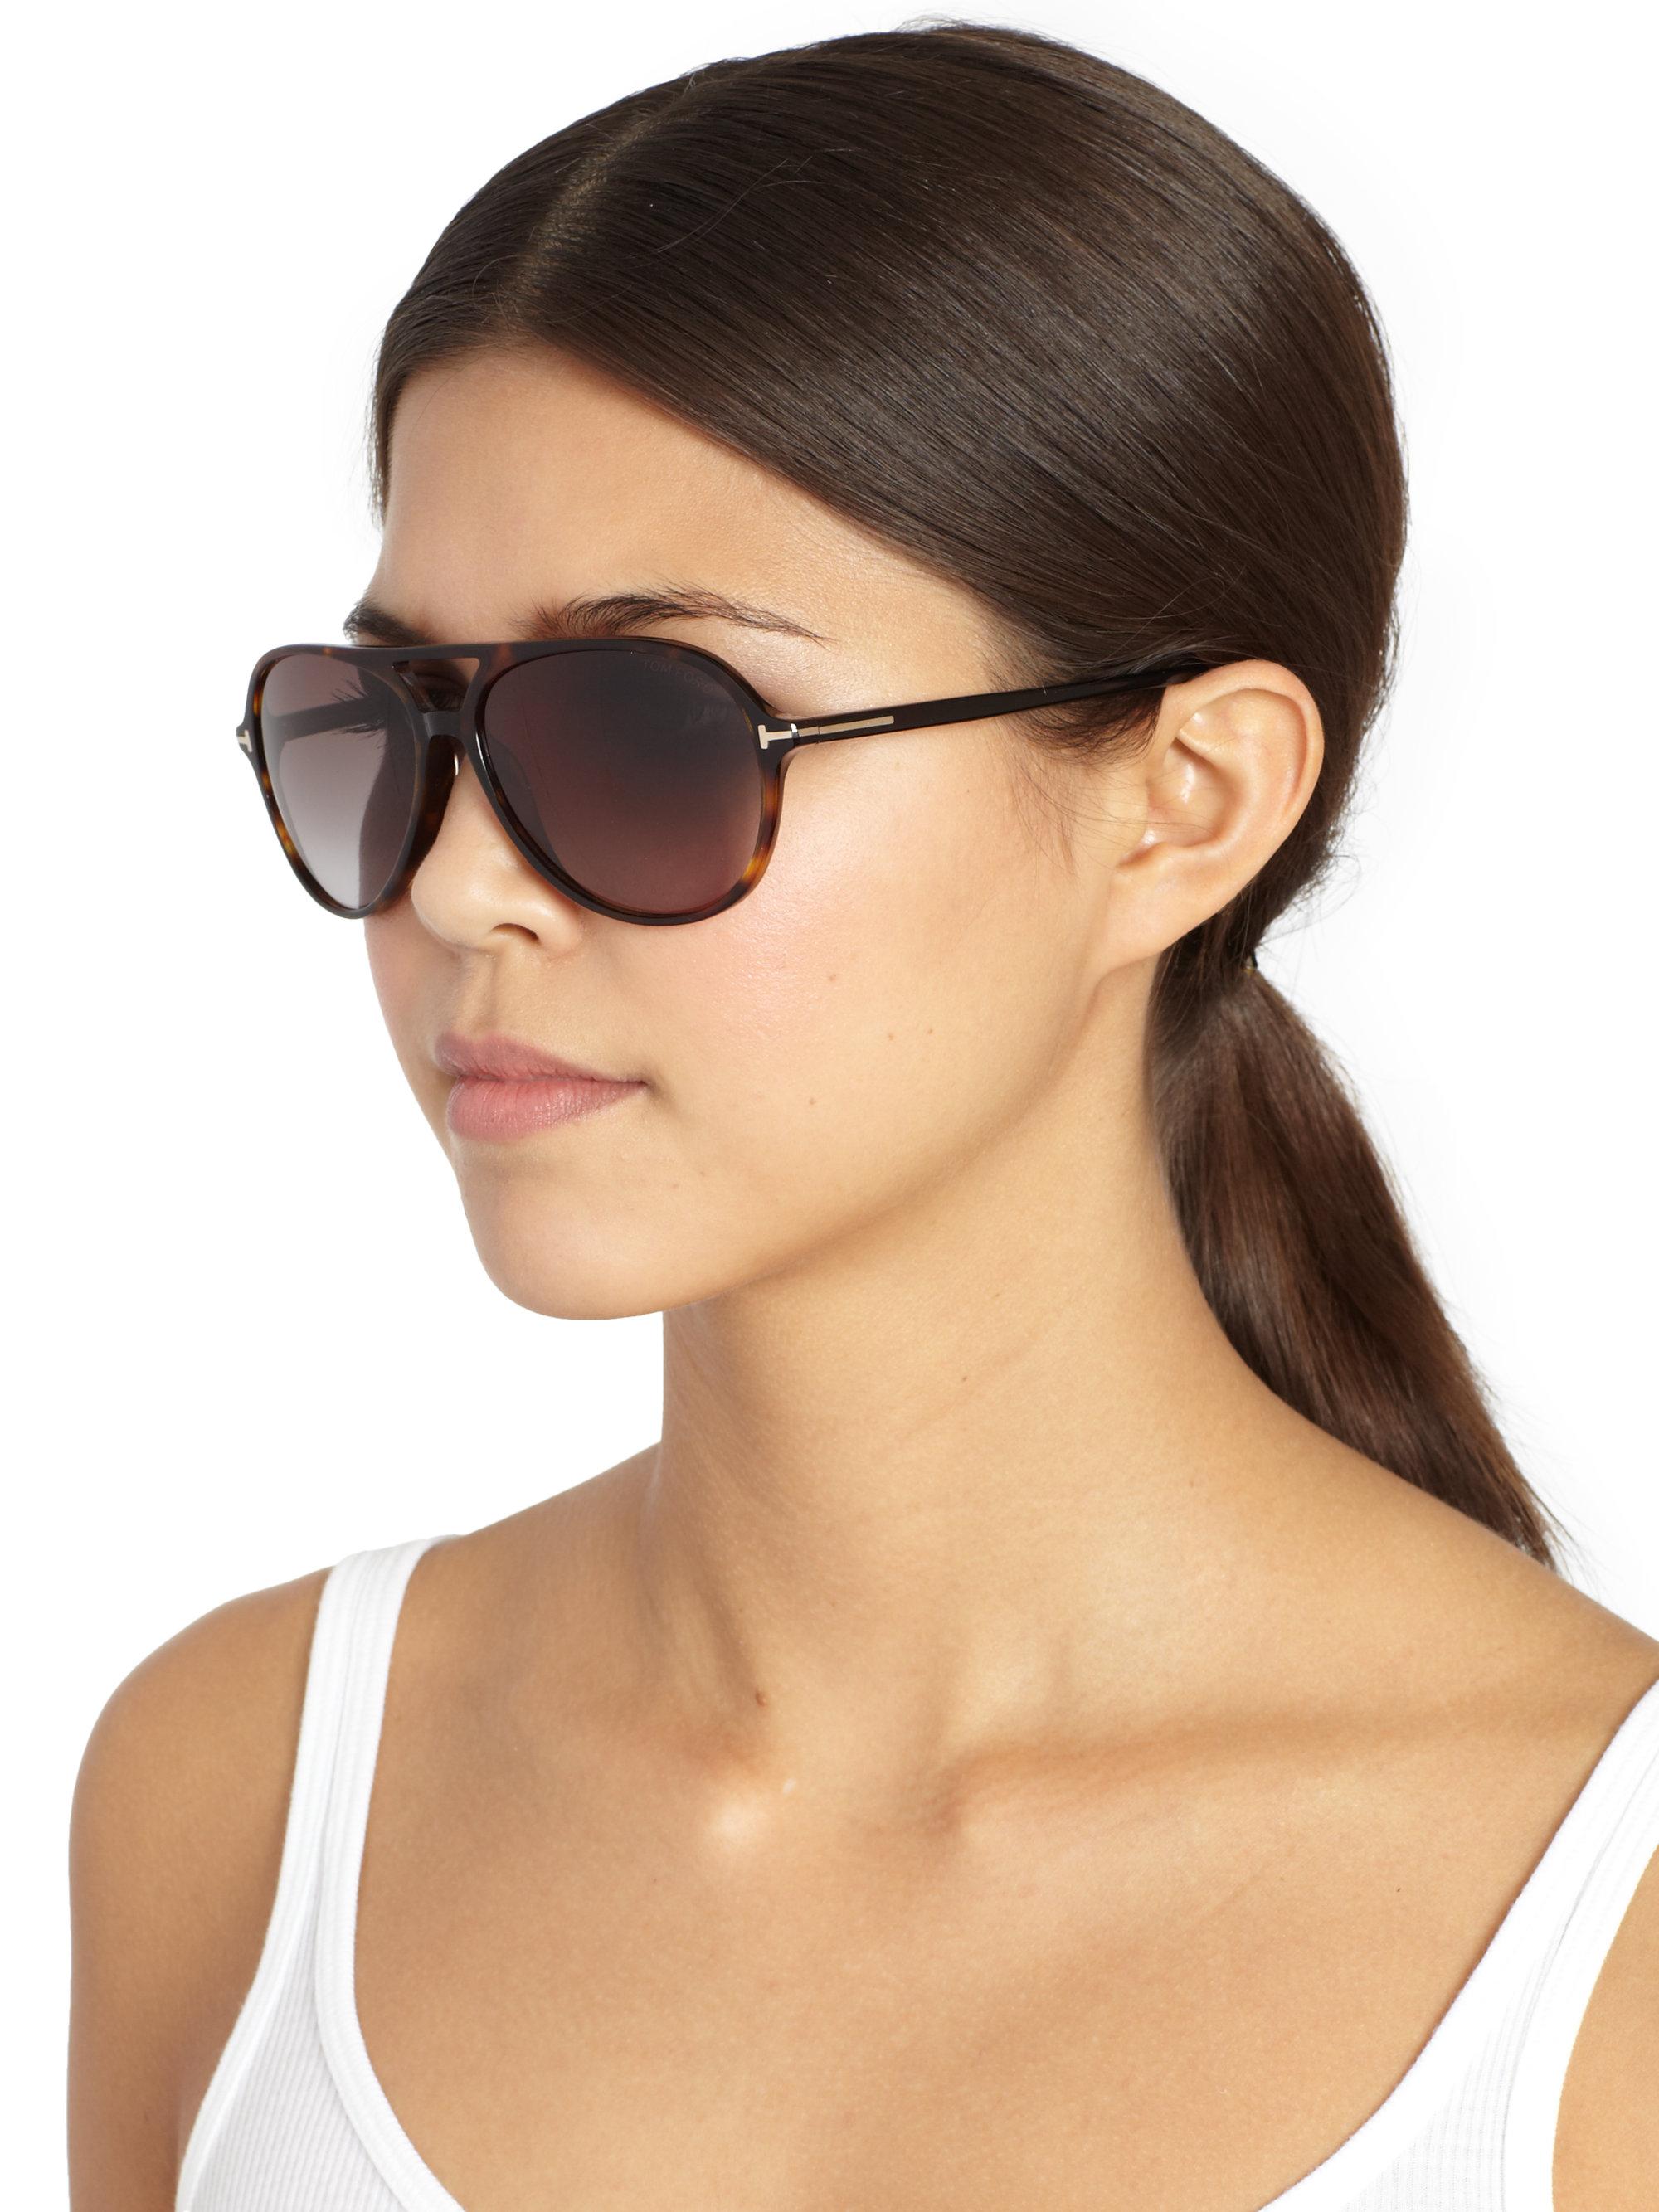 329d3349992 Lyst - Tom Ford Jared Plastic Aviator Sunglasses in Black